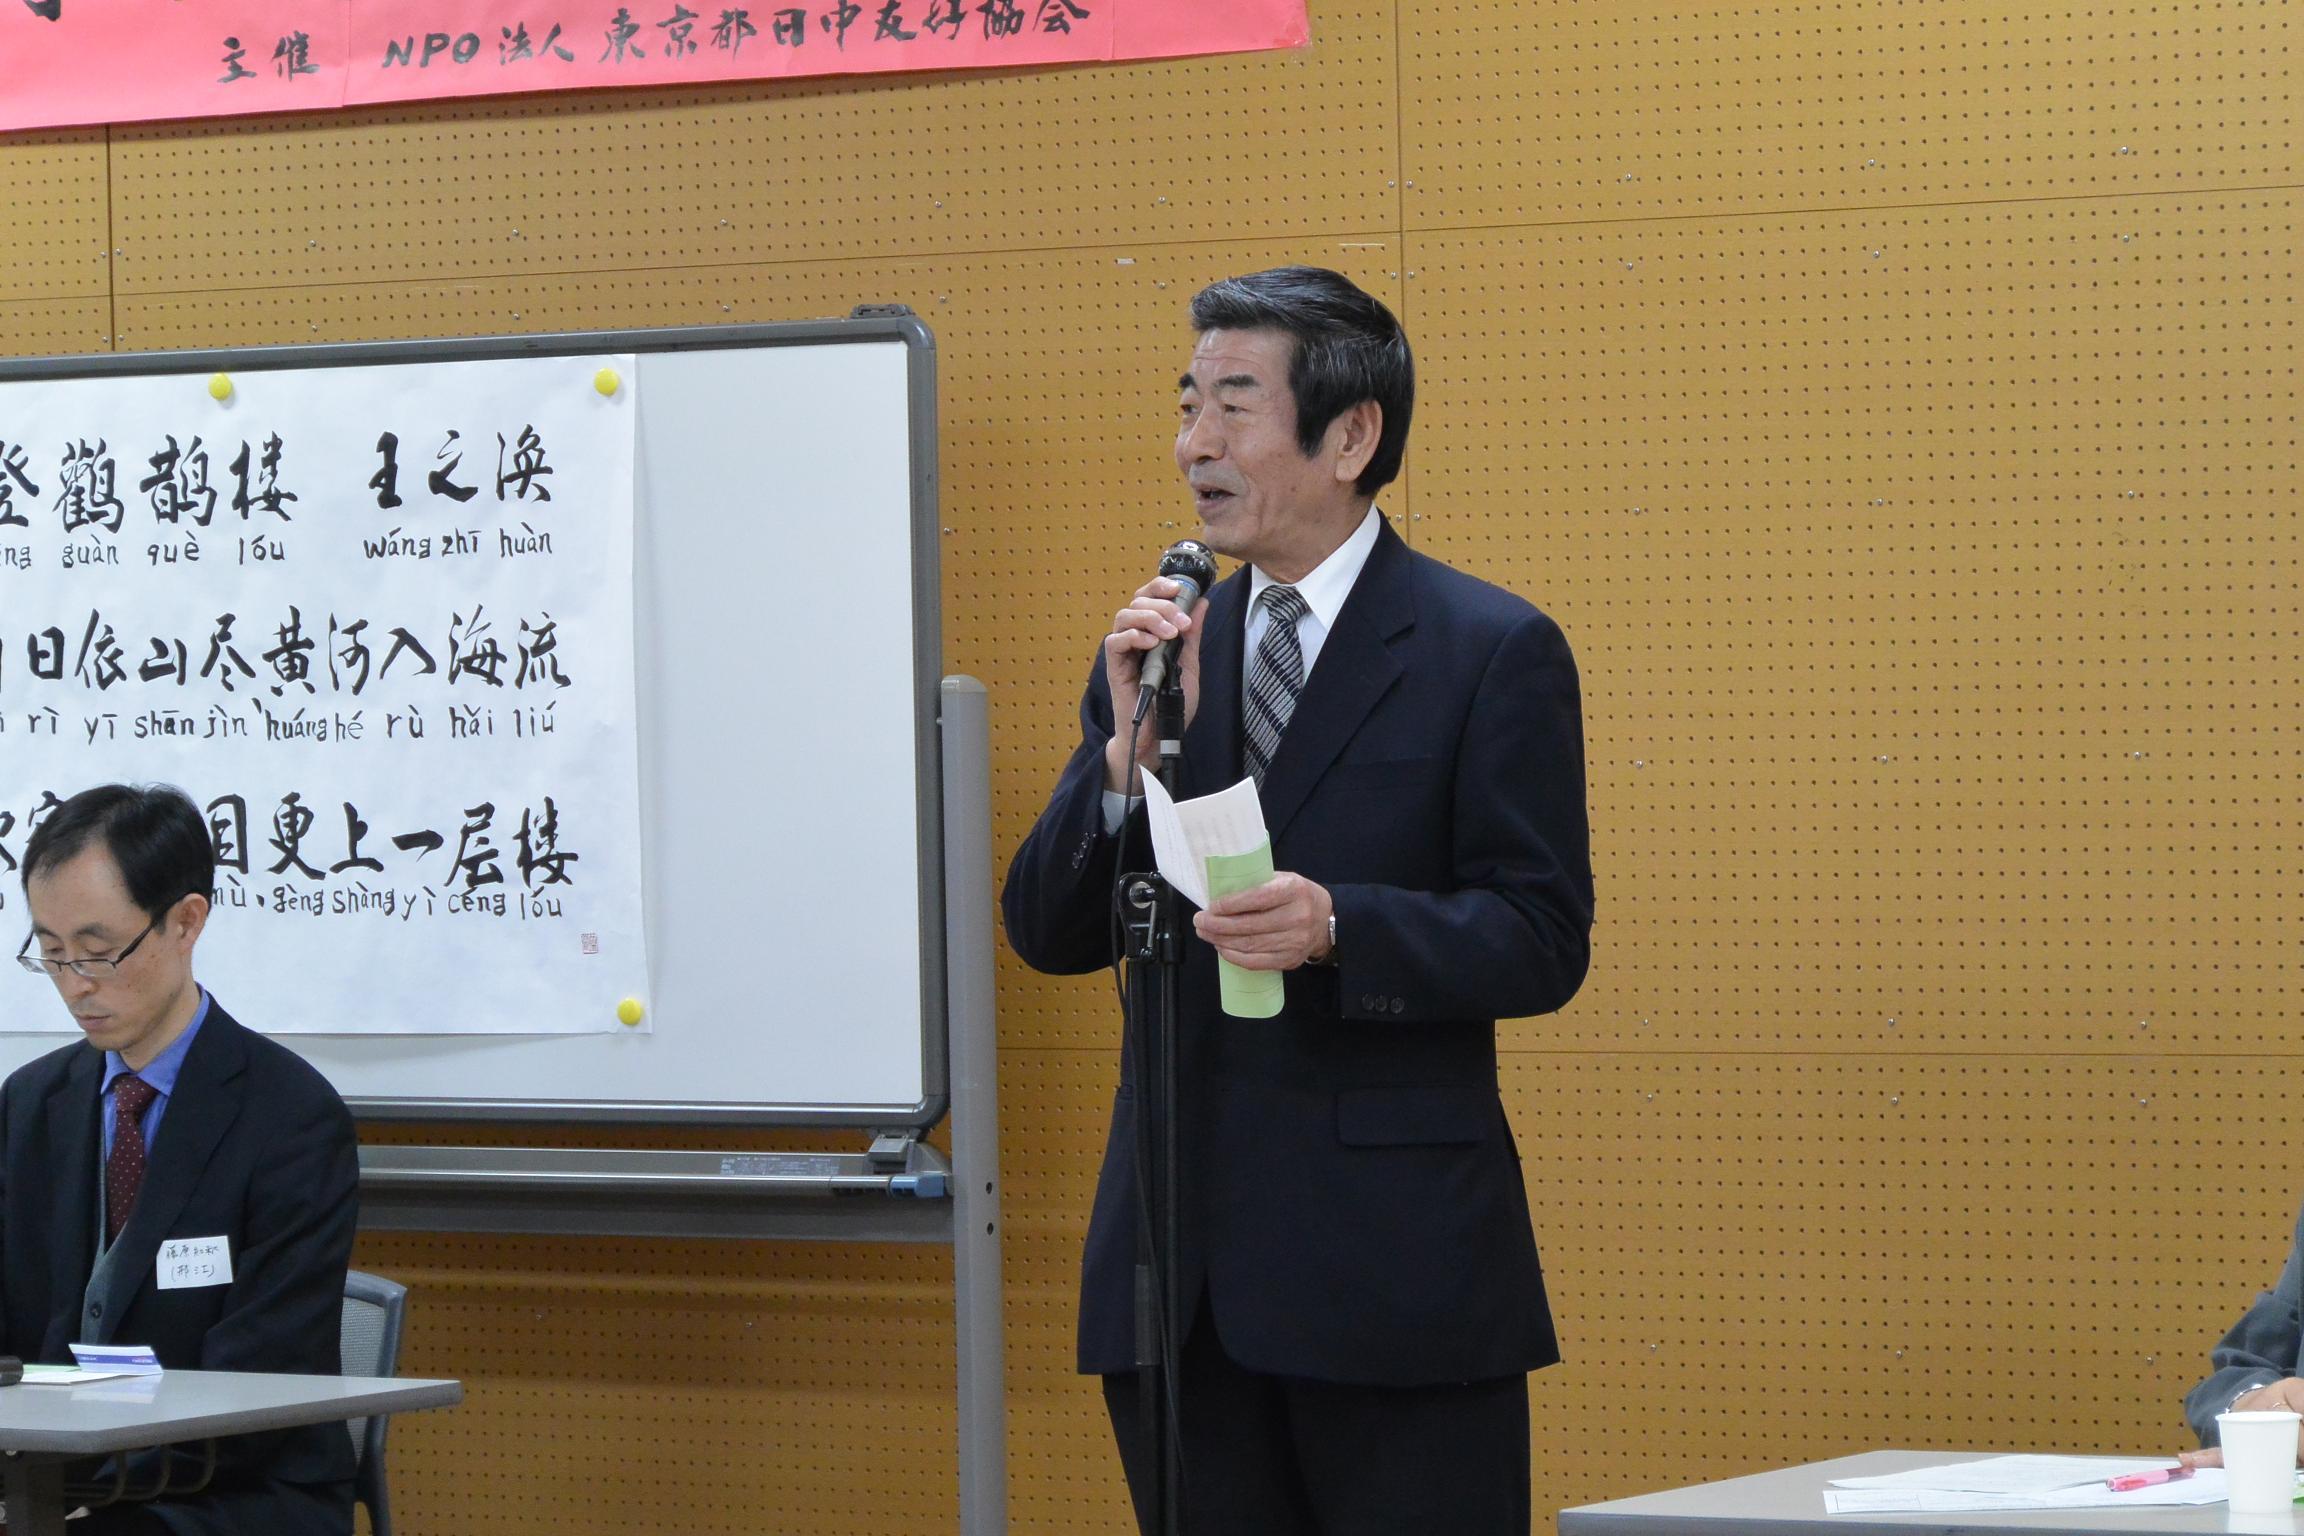 20140126karuta002